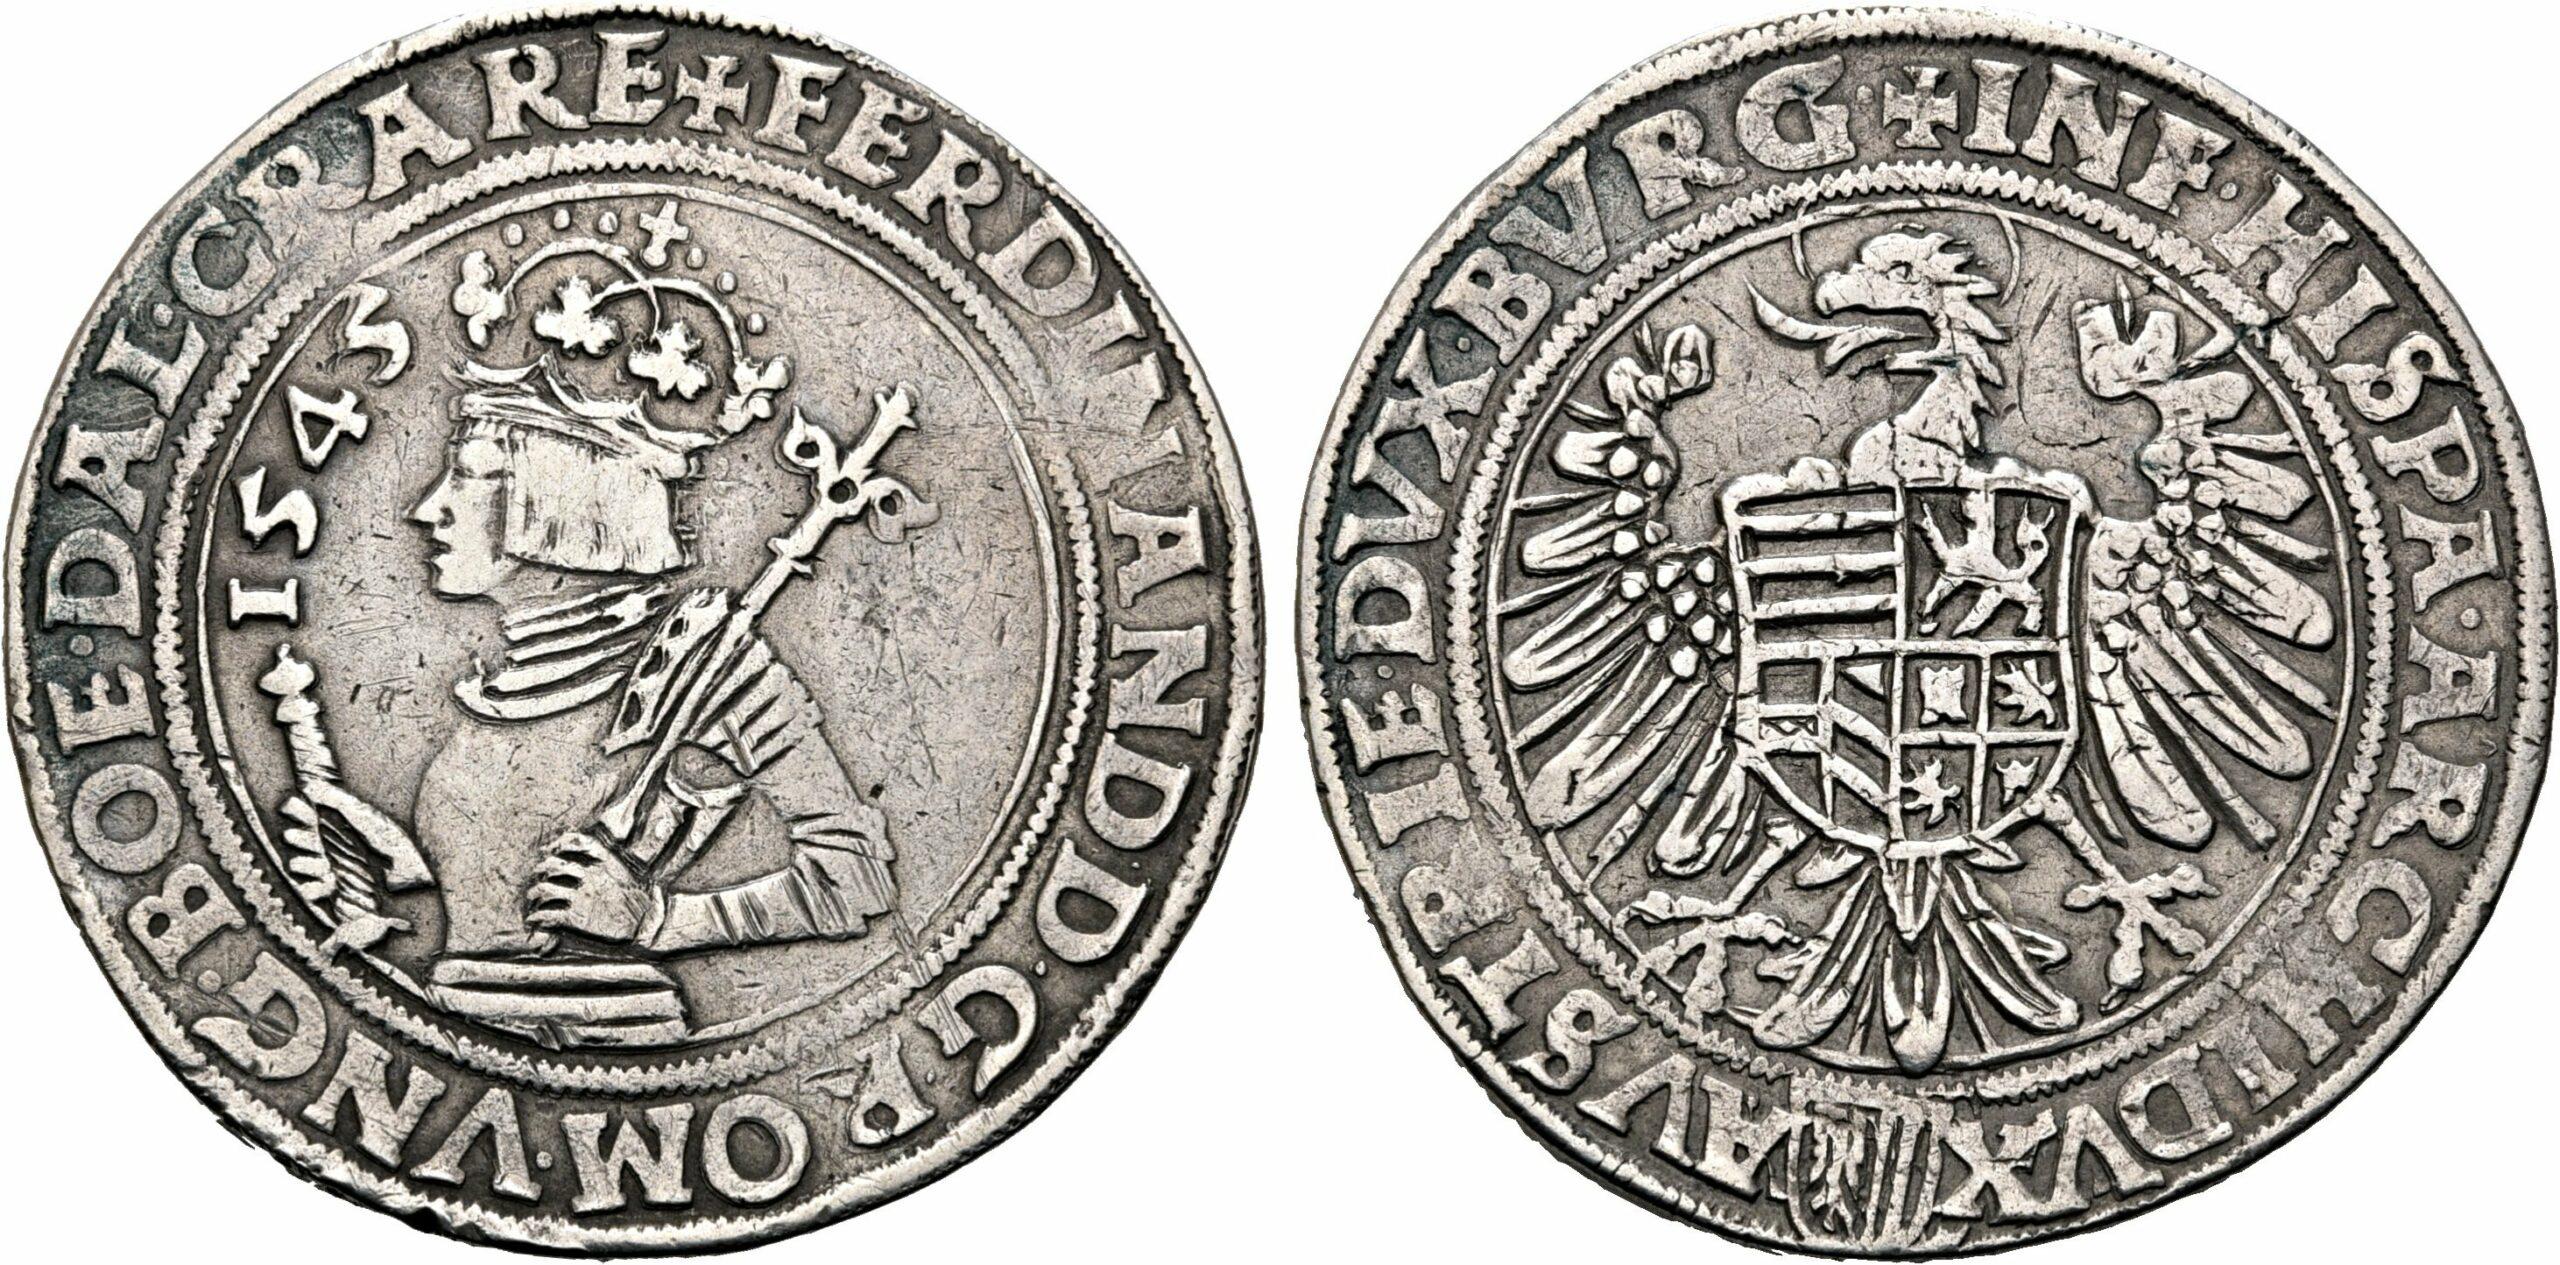 HRR 1 Taler 1545 Arms of upper Austria